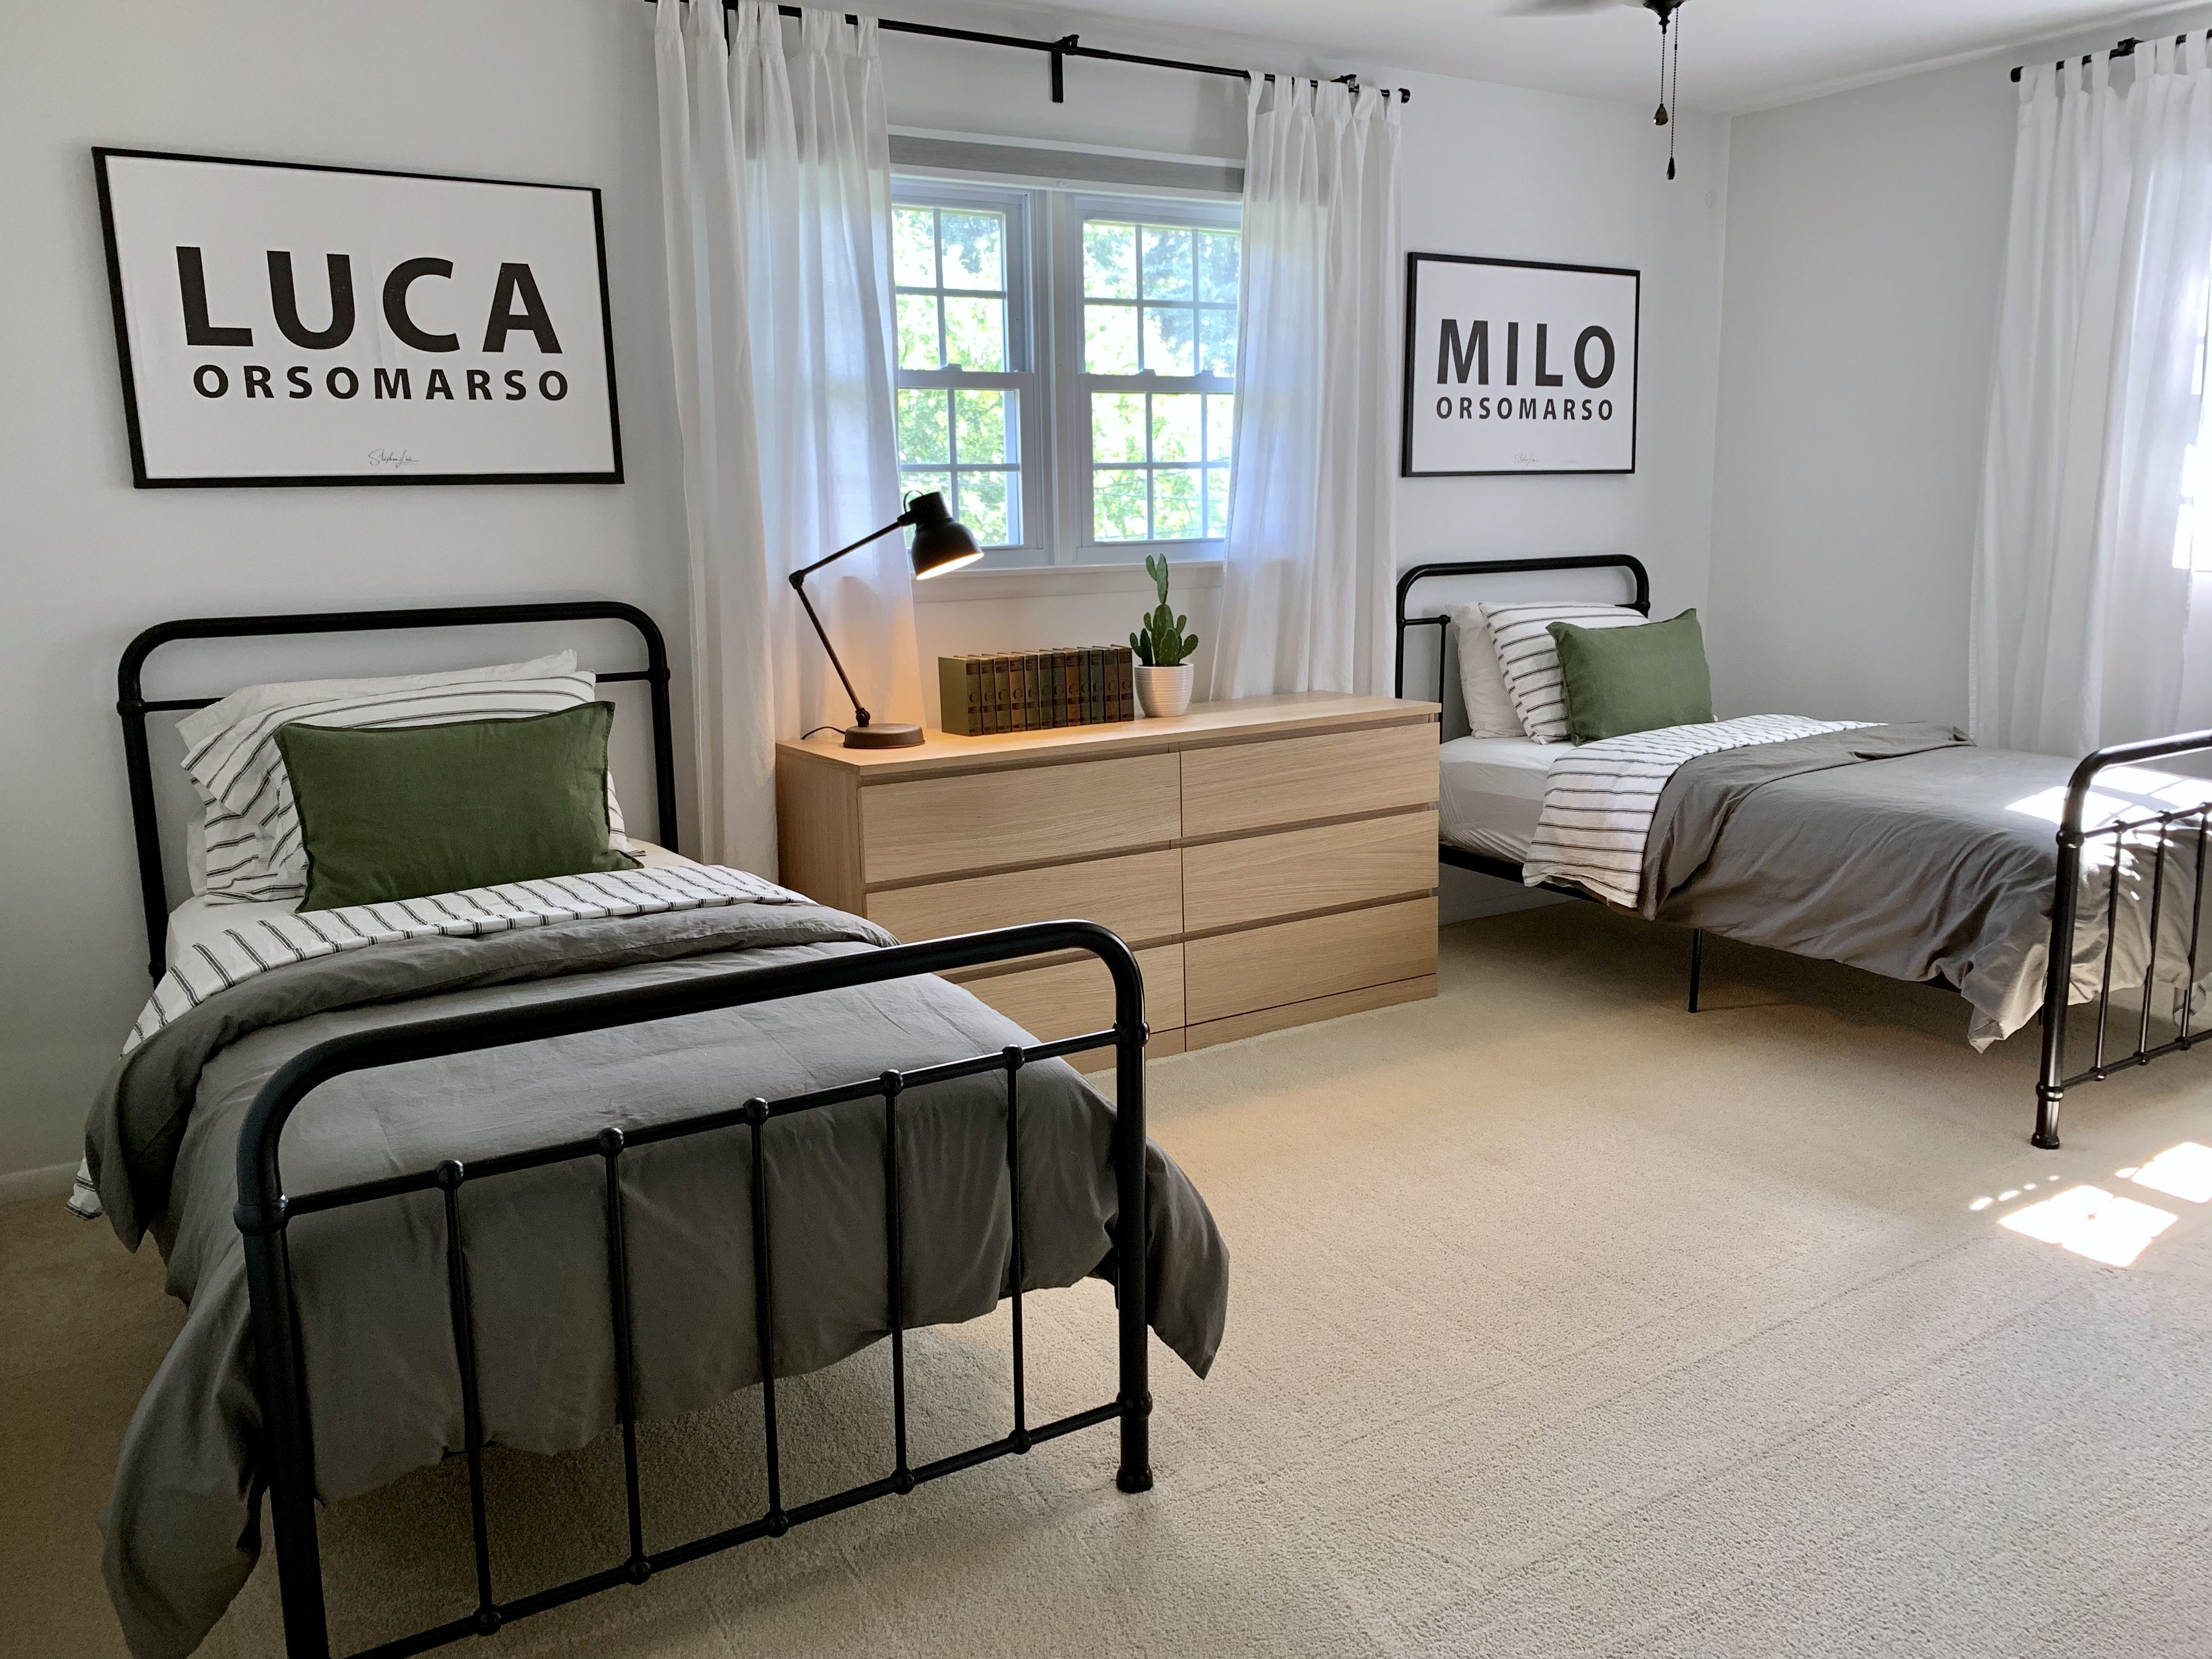 Boys Bedroom Twin Iron Beds Ikea Malm Dresser Boys Shared Bedroom Twin Boys Bedroom Big Boy Bedrooms